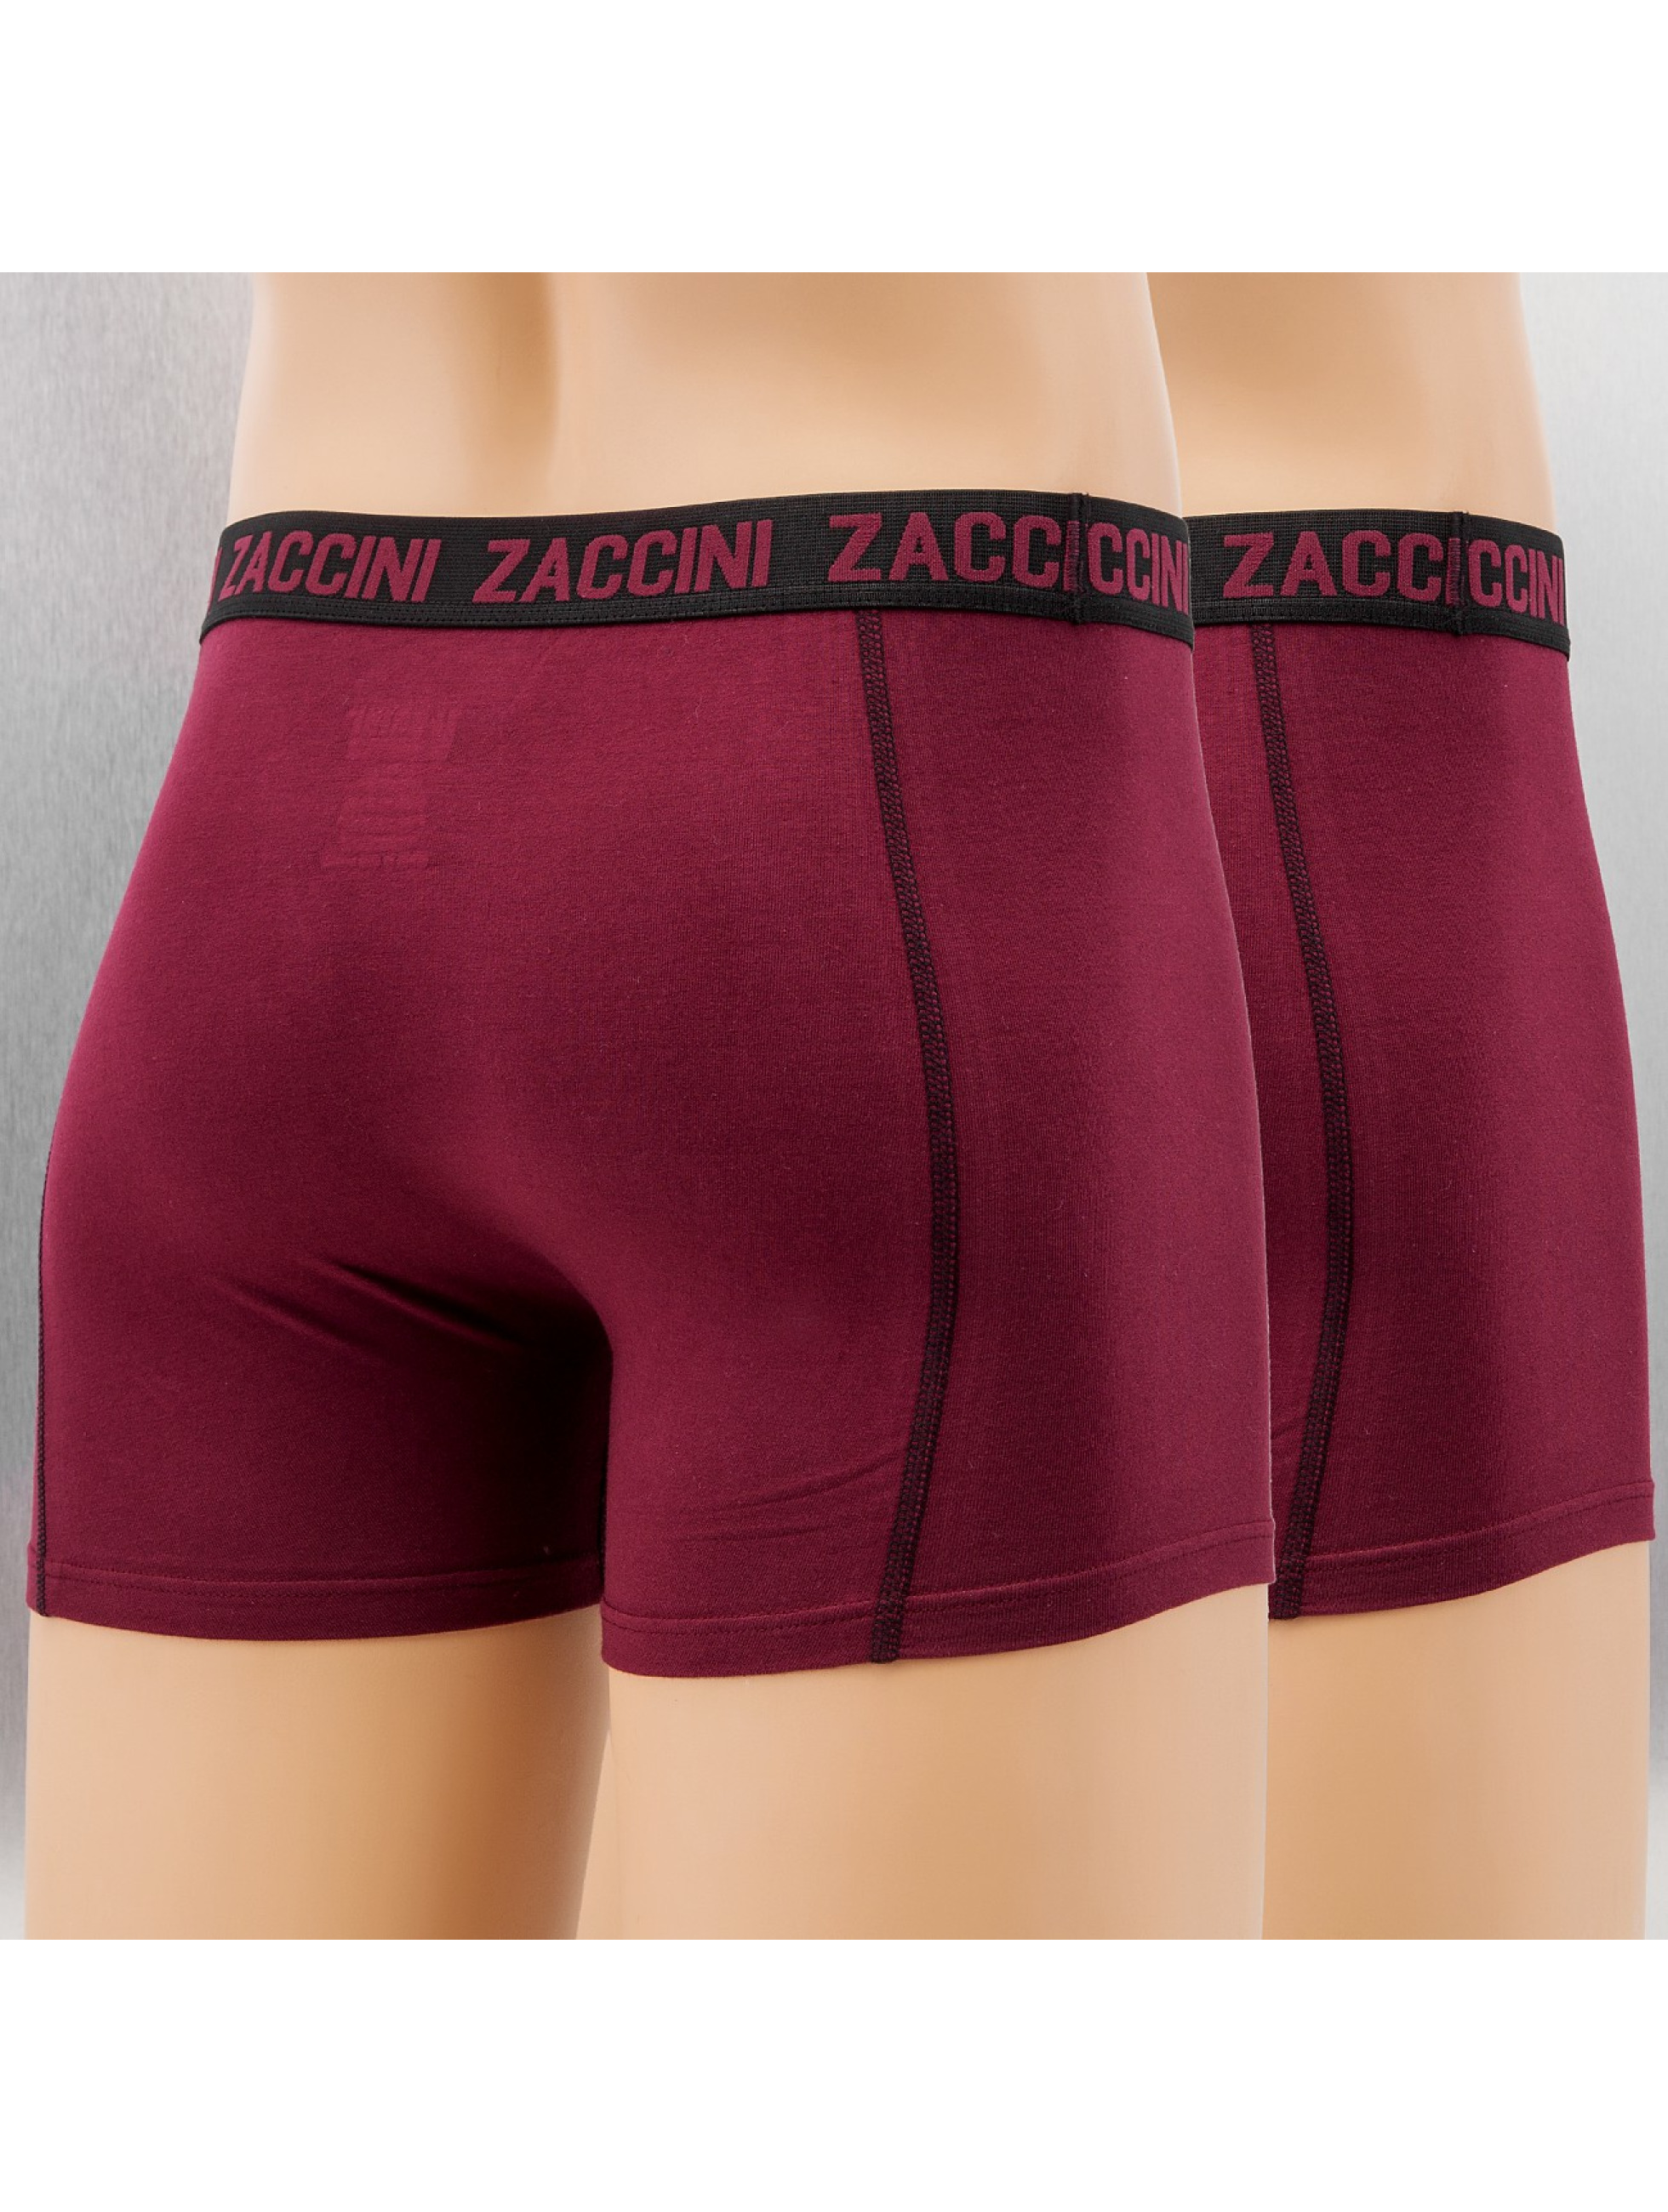 Zaccini Bokserit Uni 2-Pack punainen